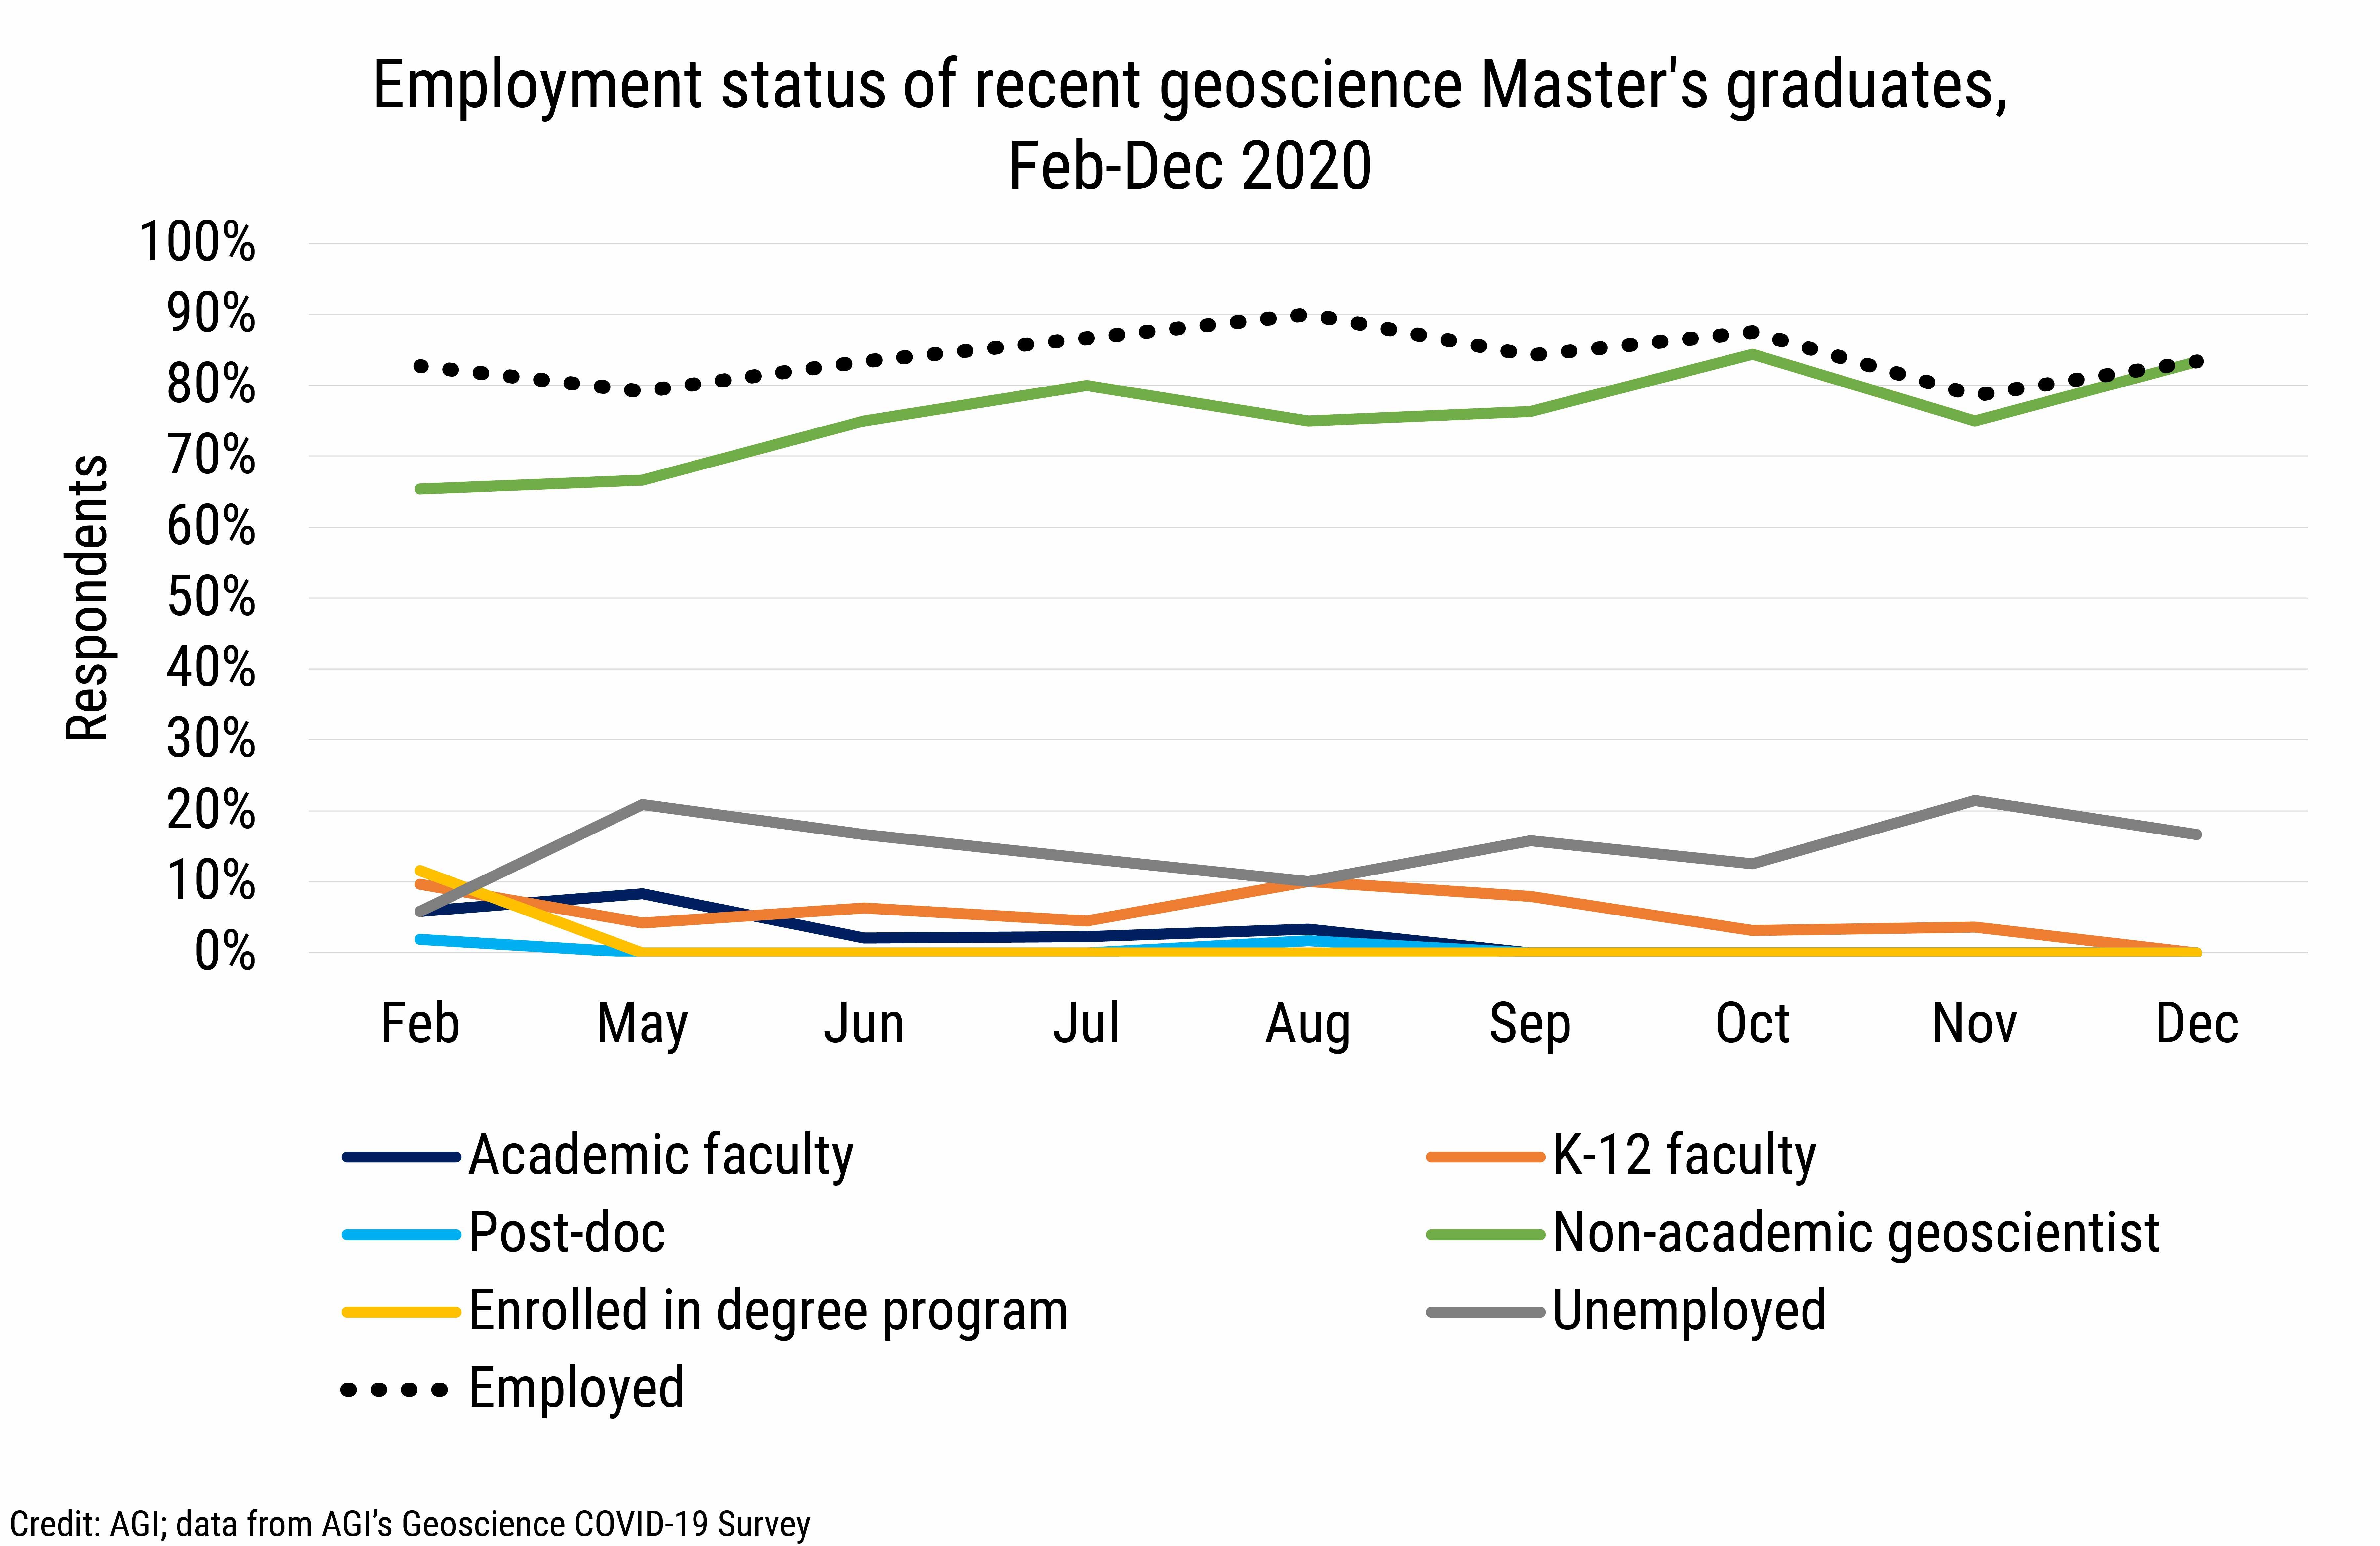 DB_2021-003_chart07: Employment status of recent geoscience Master's graduate, Feb-Dec 2020 (Credit: AGI; data from AGI's Geoscience COVID-19 Survey)